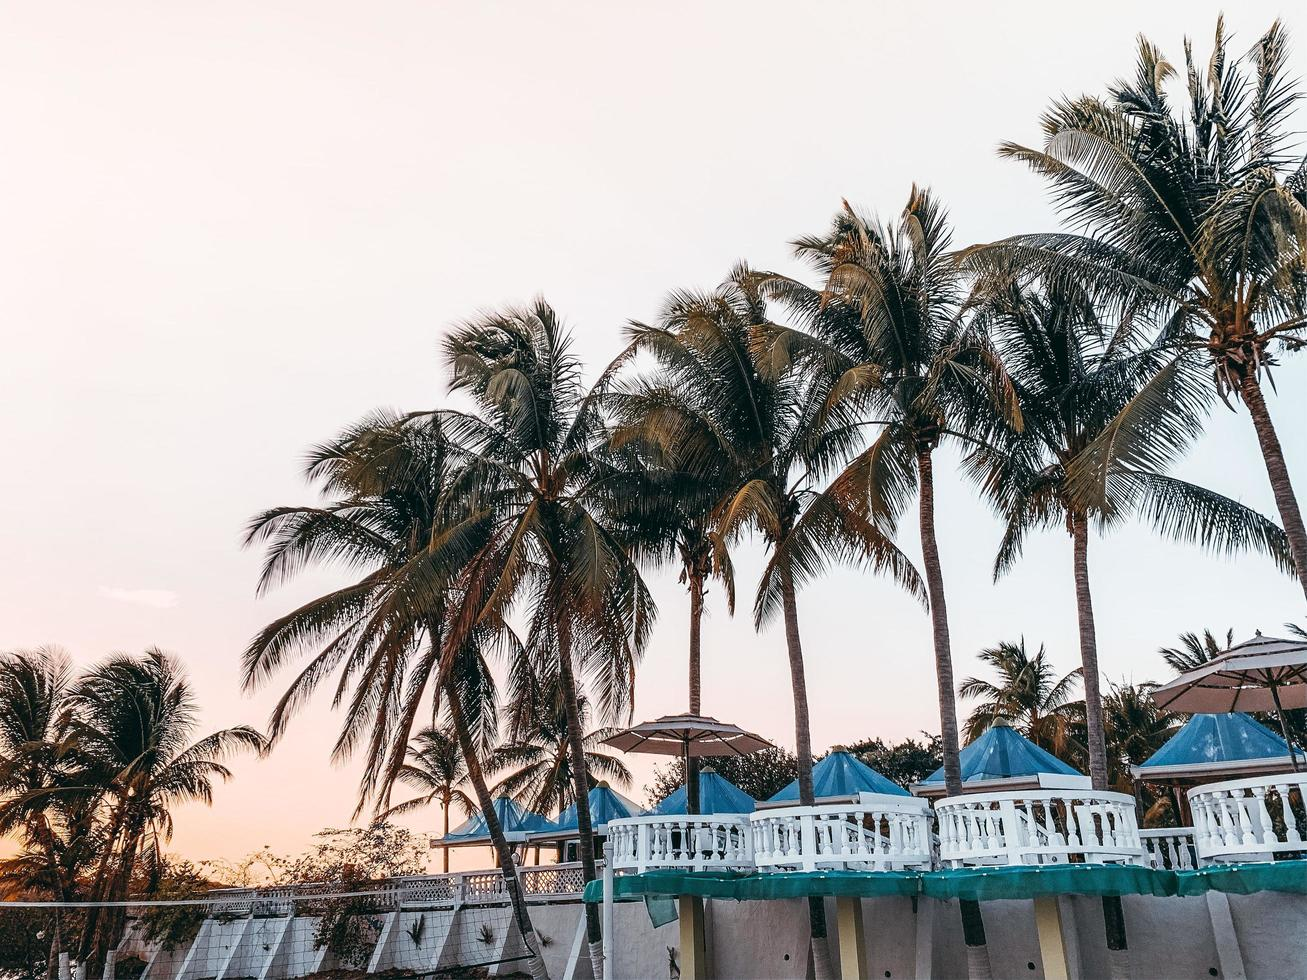 palme in un resort foto